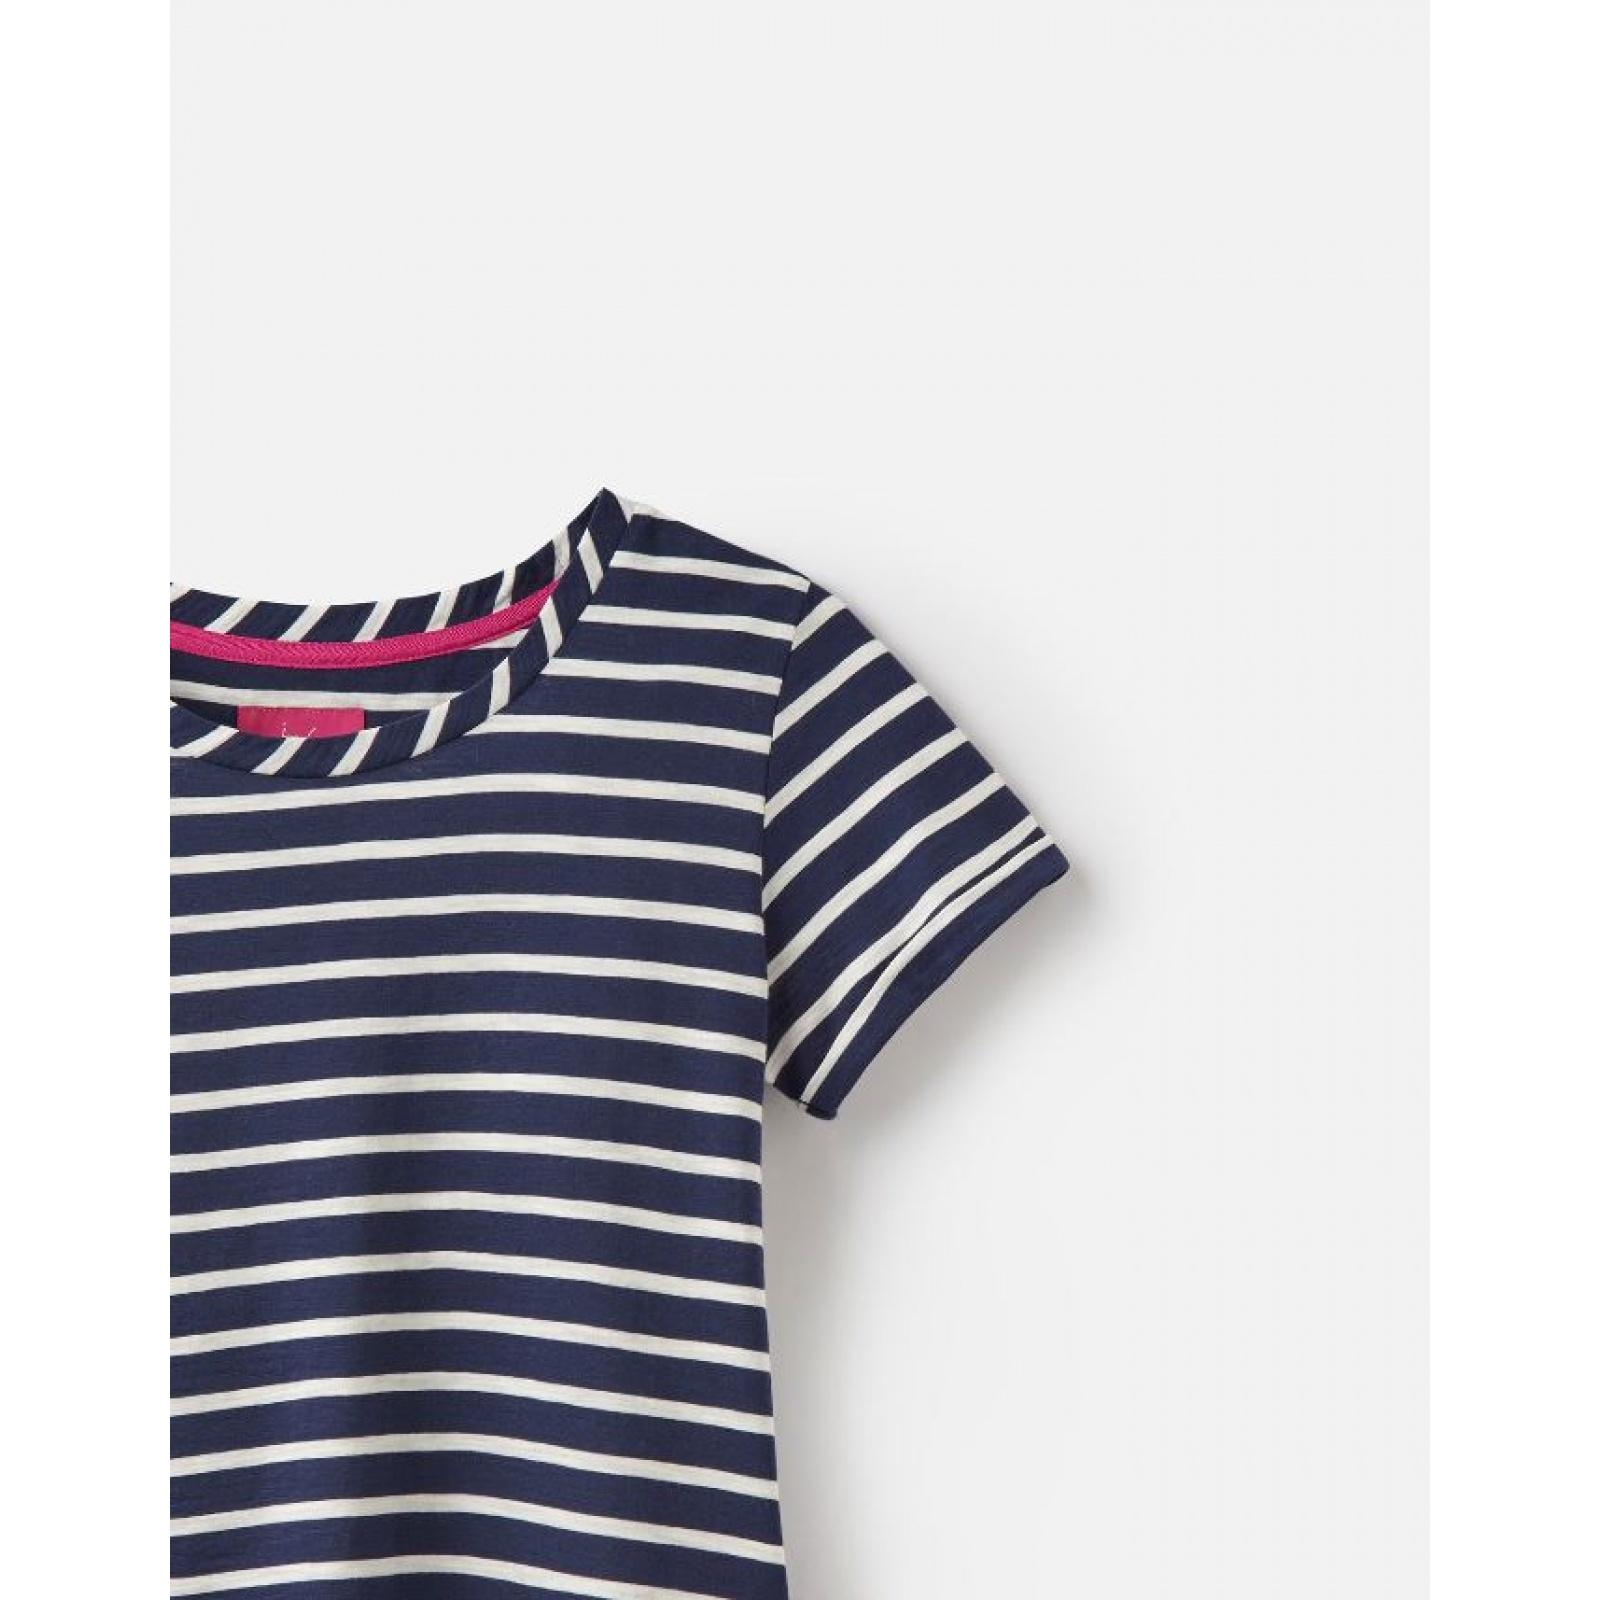 Joules-Nessa-Raya-Ligero-Jersey-Camiseta-SS19 miniatura 21